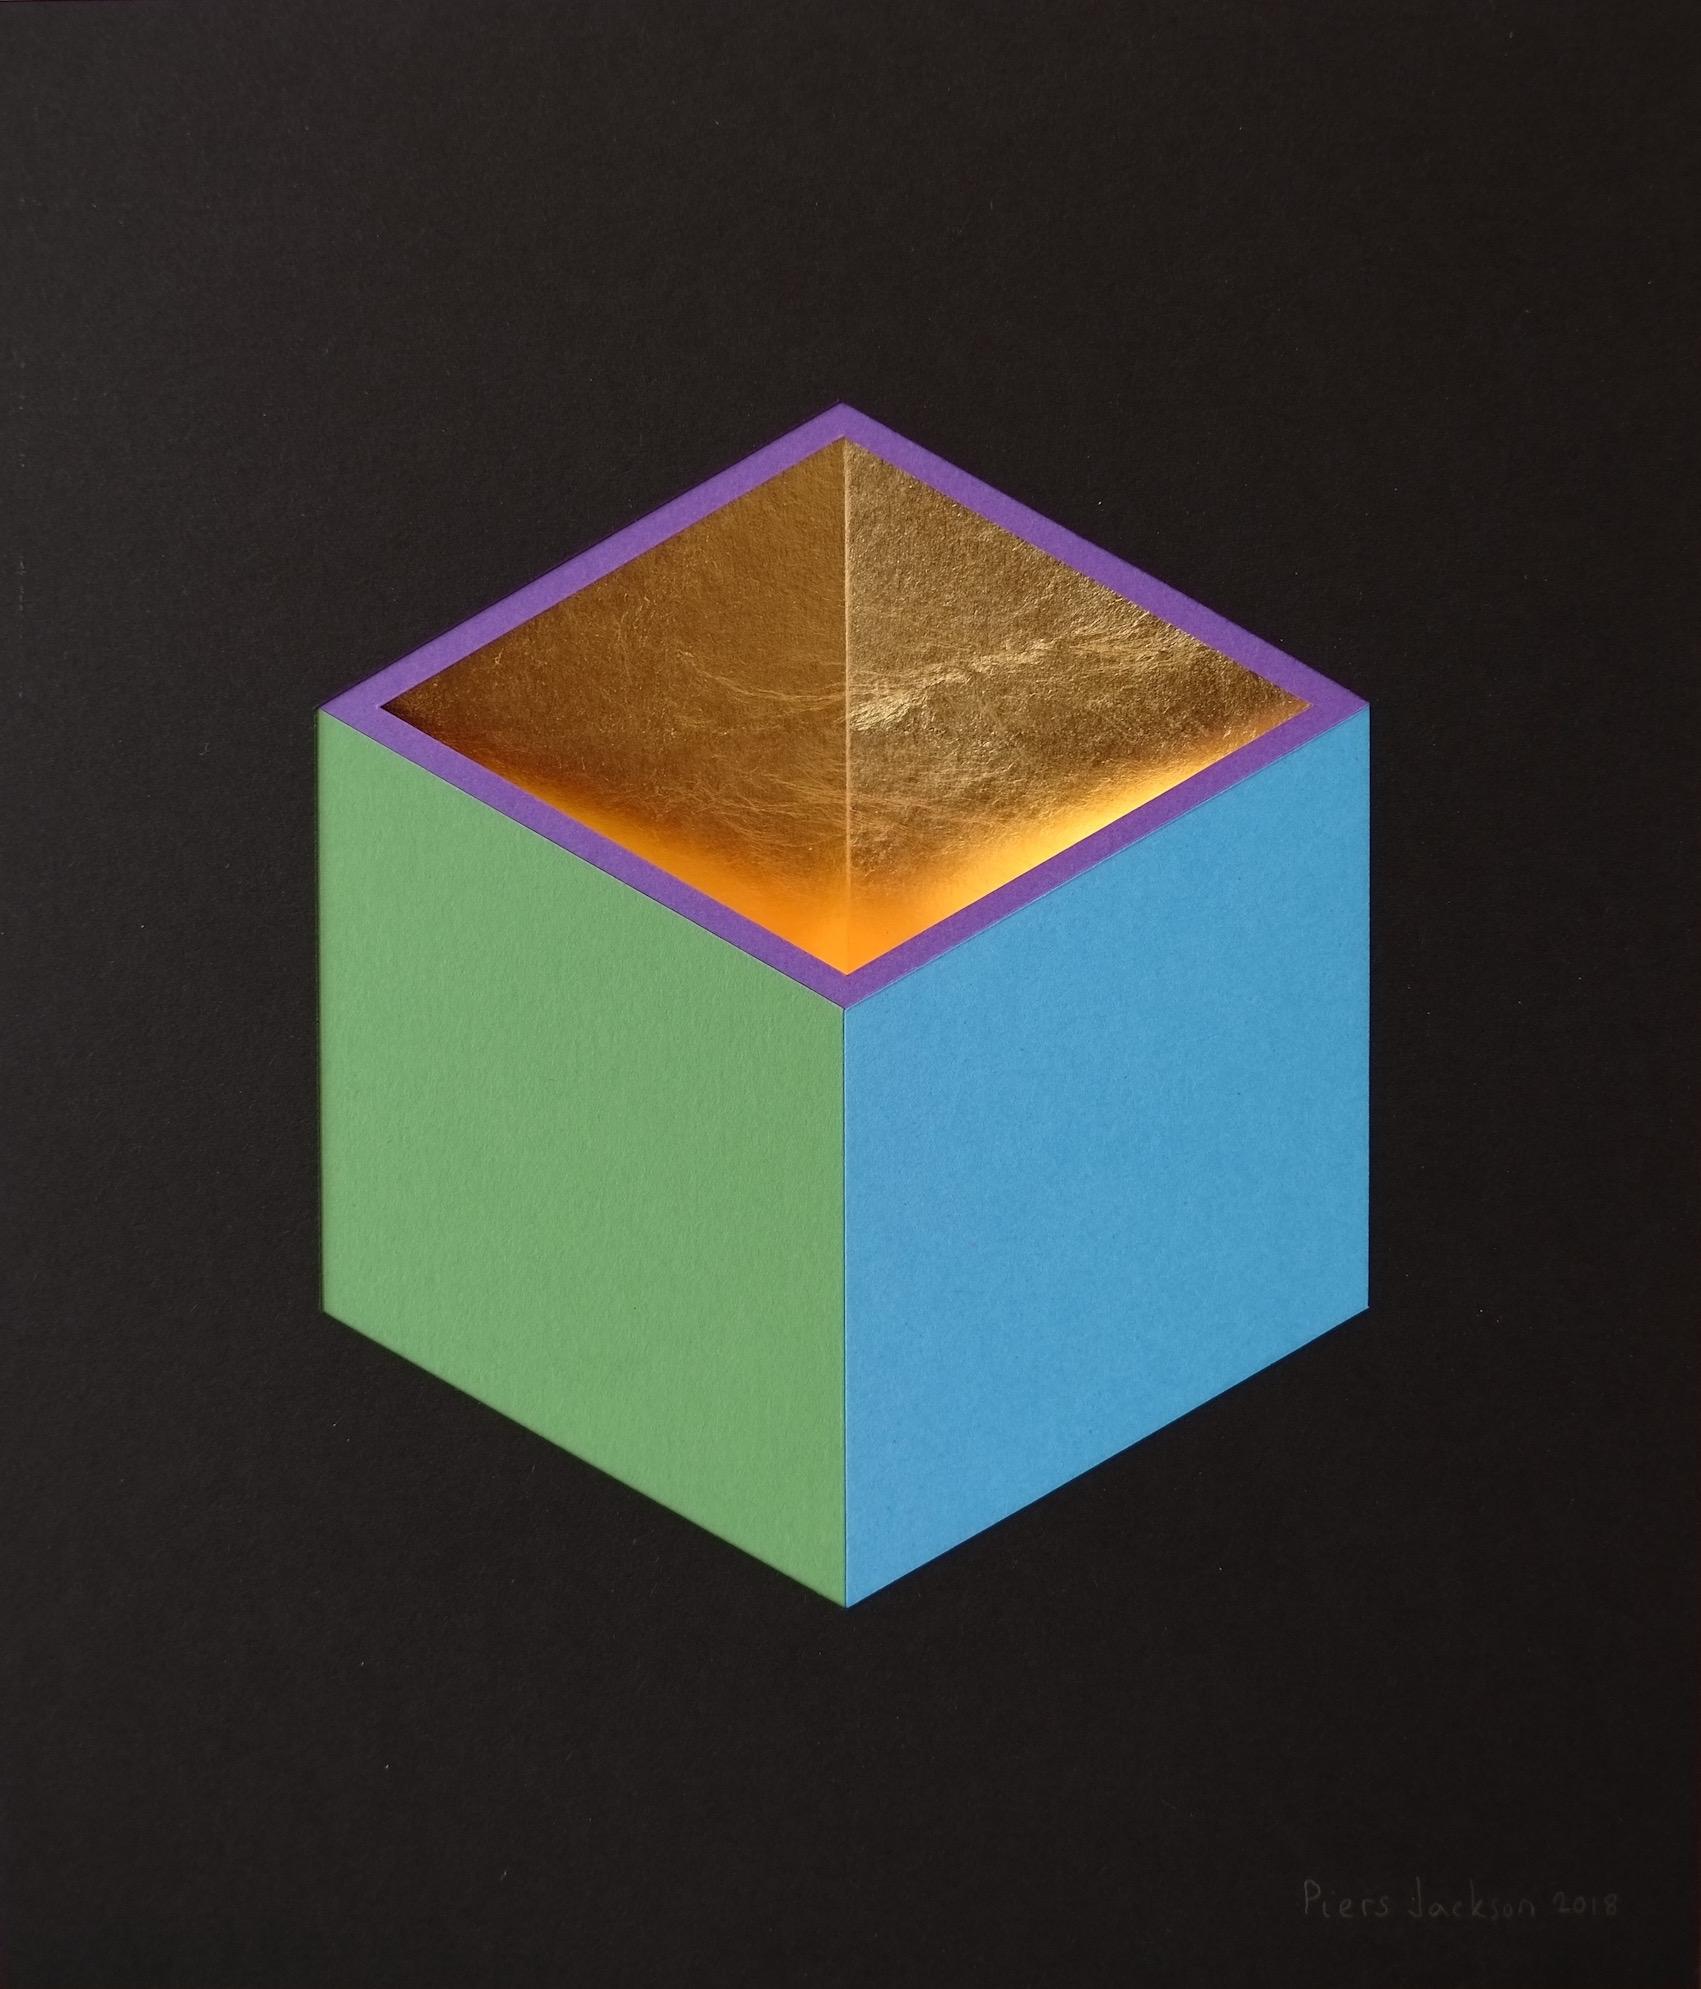 Psyche's Box 2 (2018) - Piers Jackson